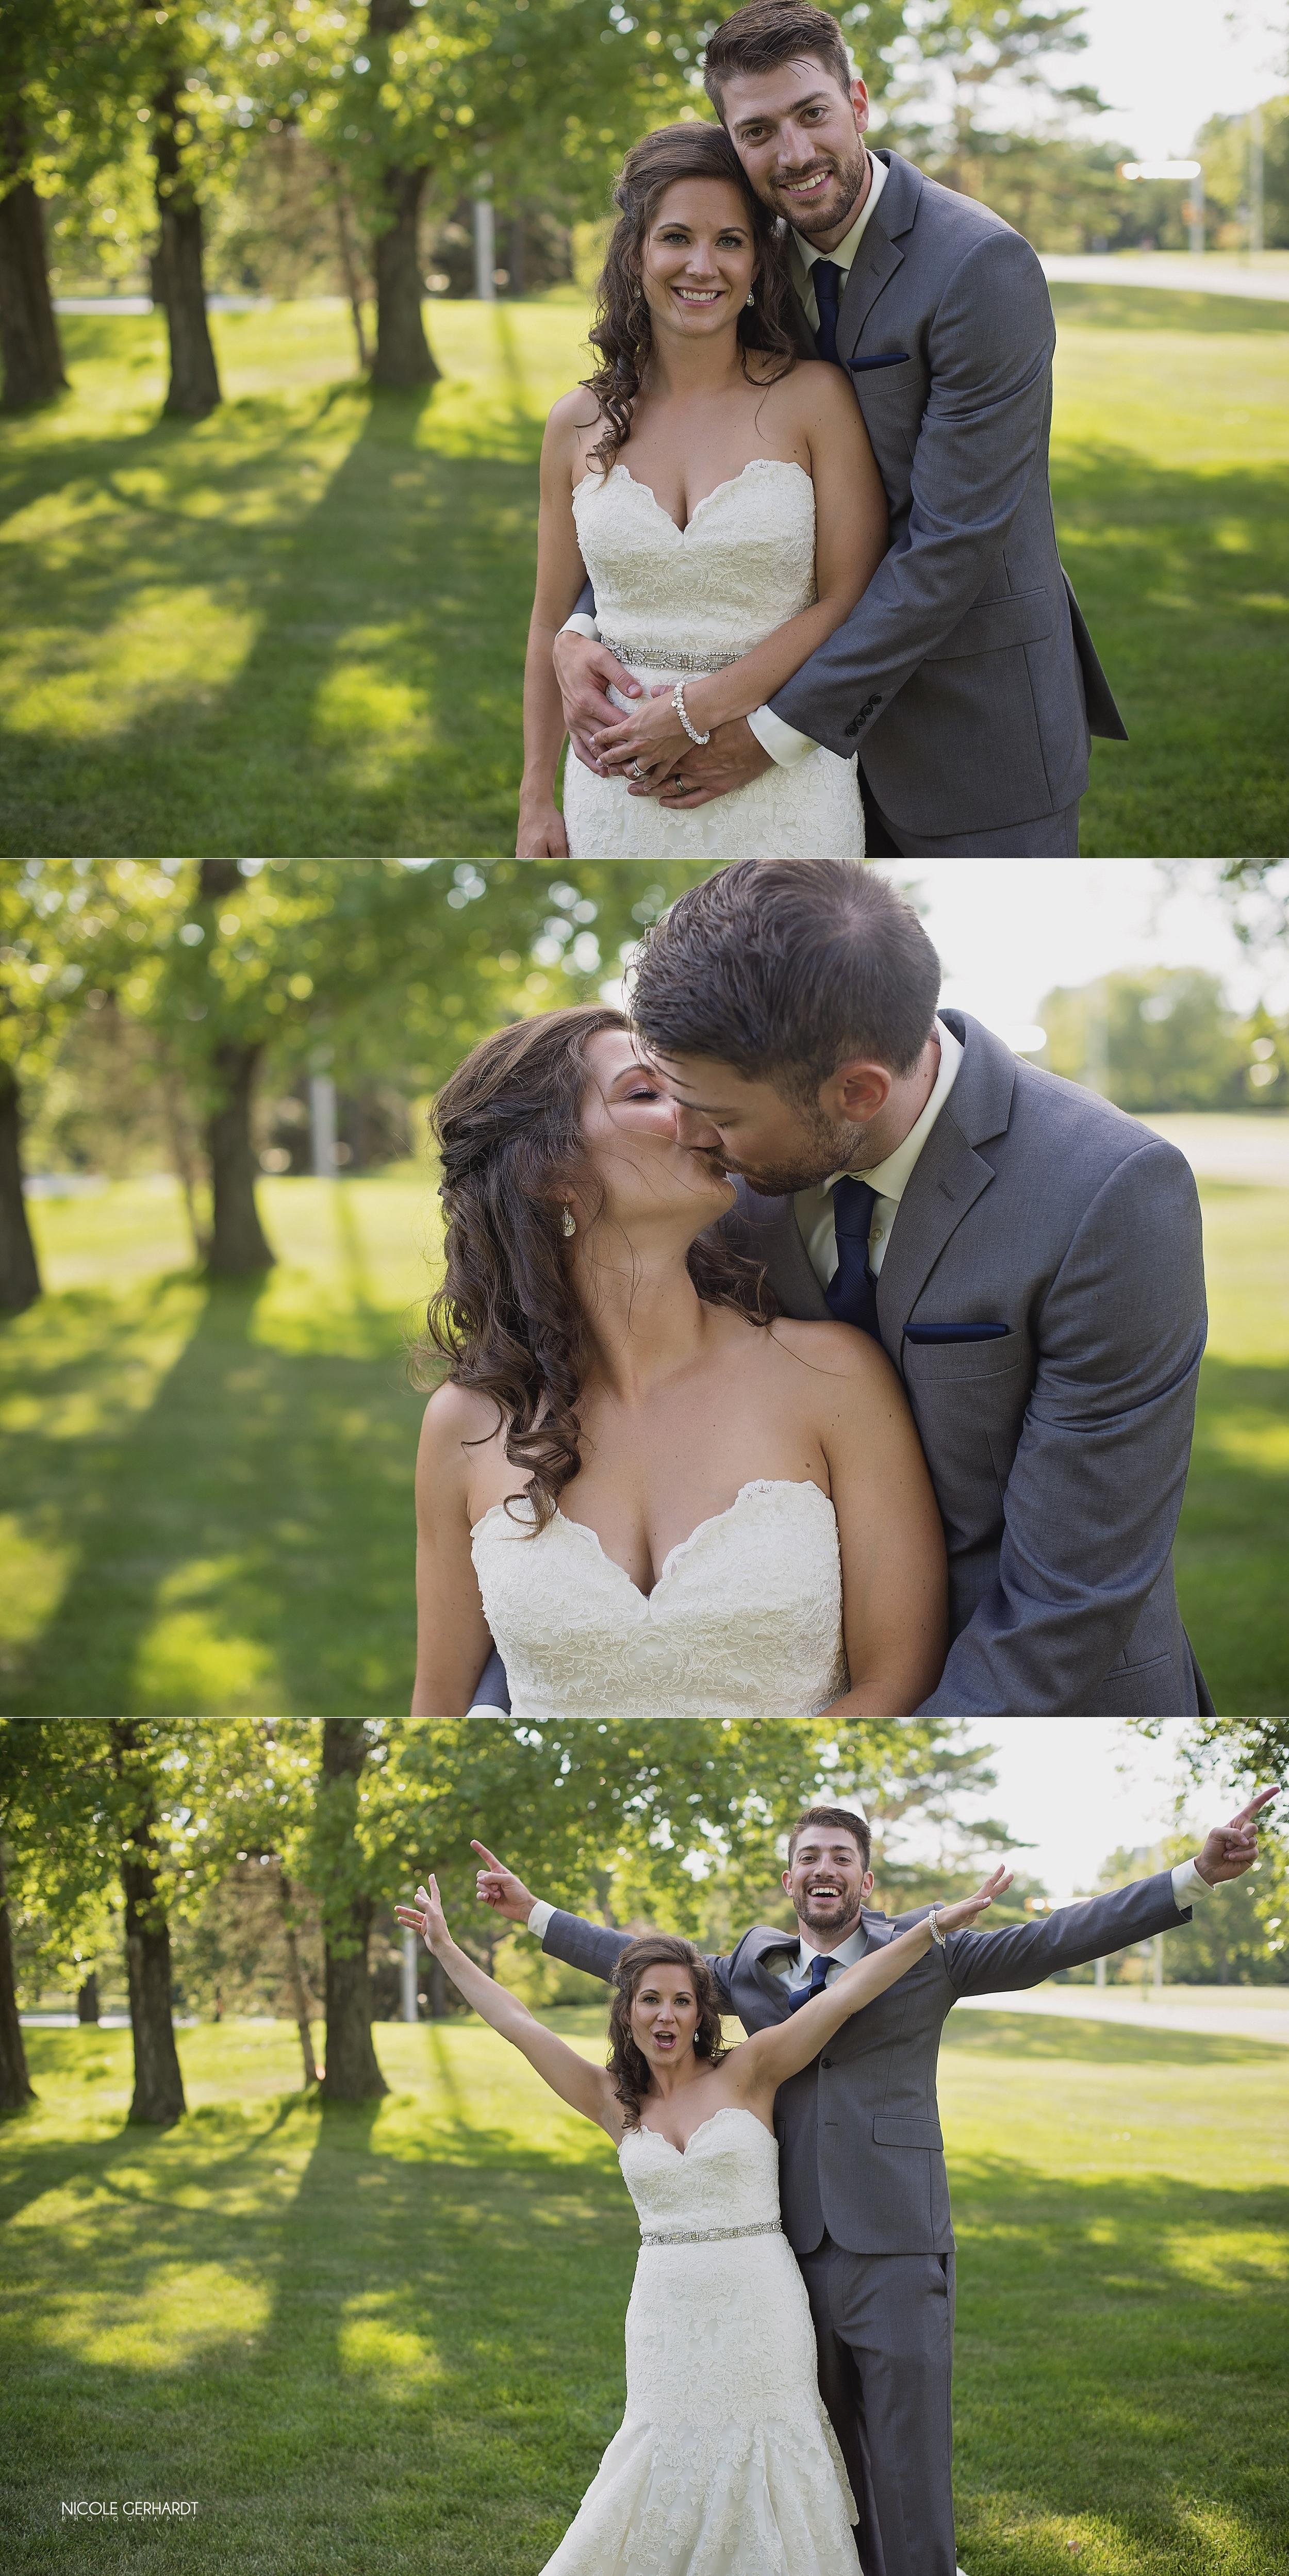 regina_wedding _ photographer6.jpg